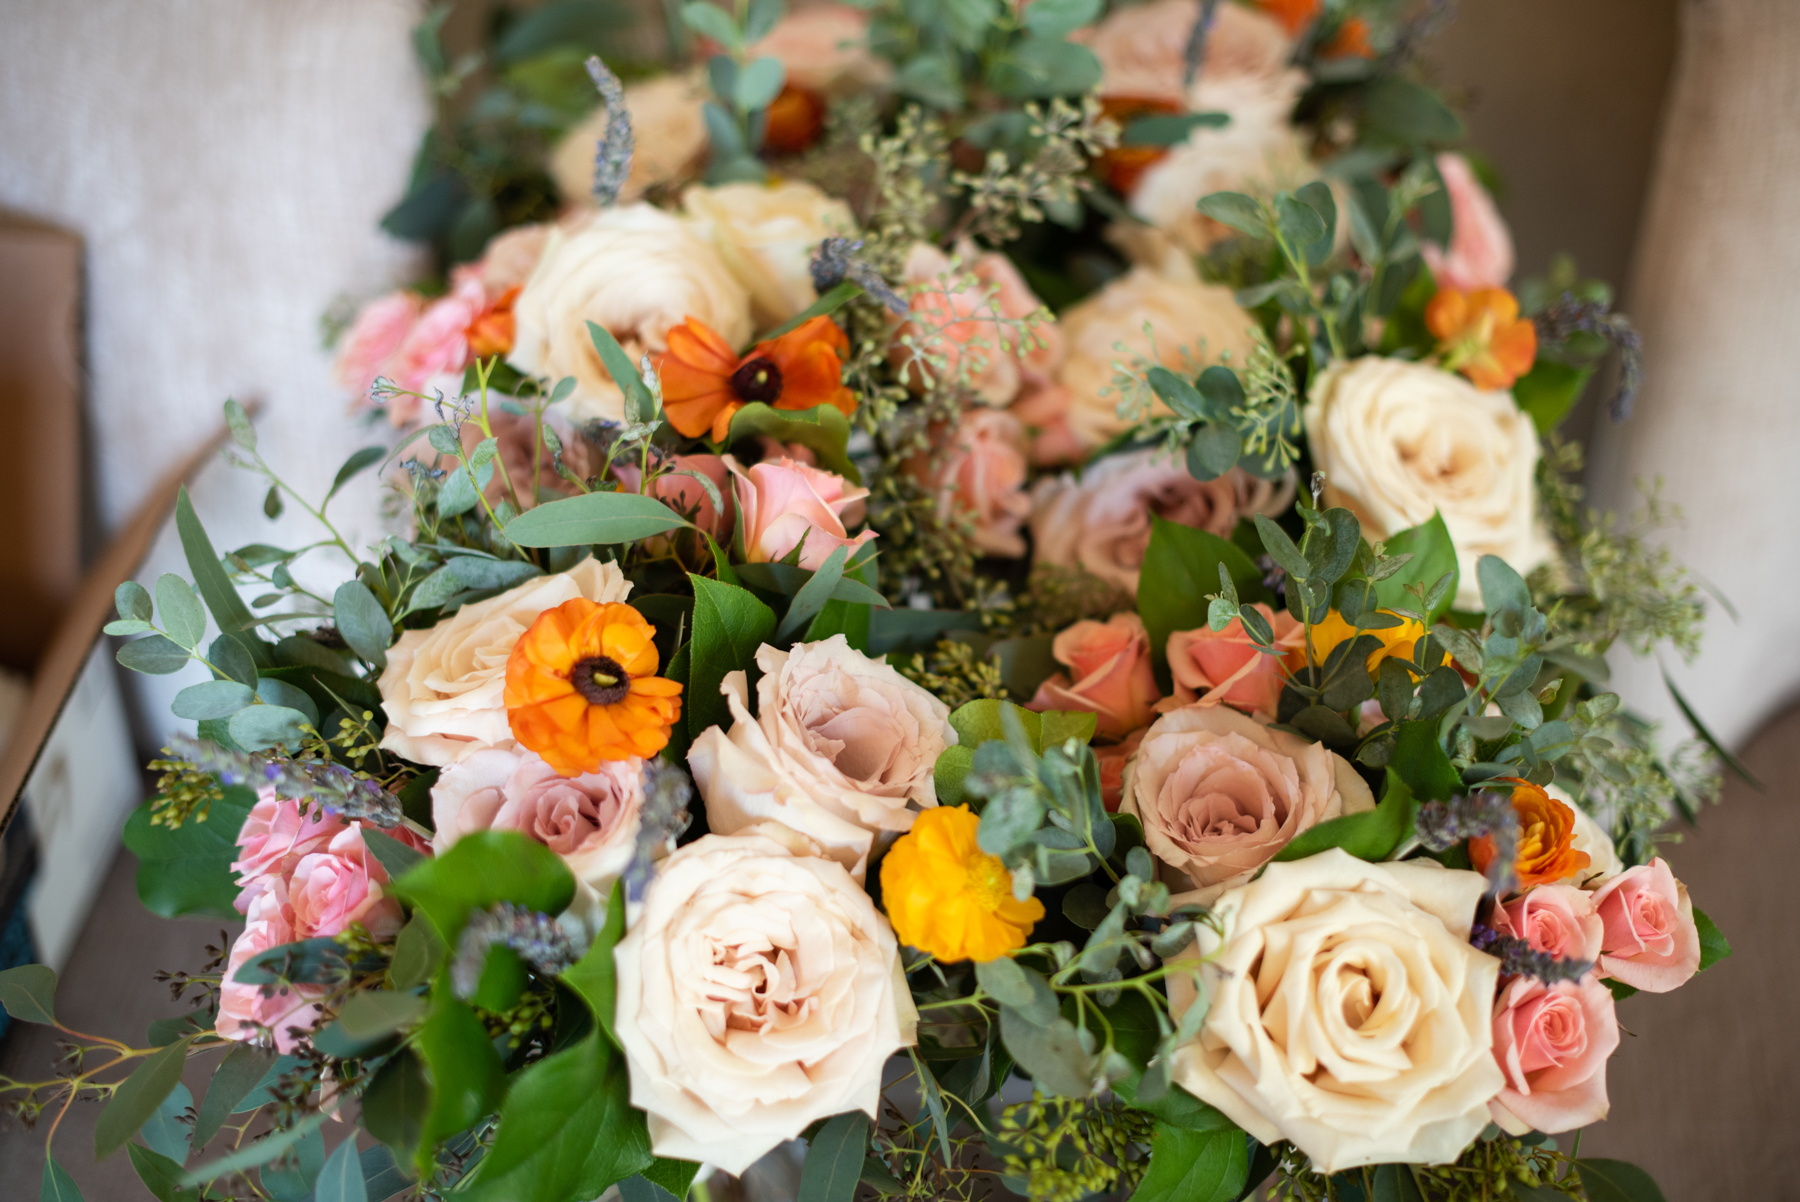 Secret Garden Event Center Wedding - Meredith Amadee Photography-9.jpg